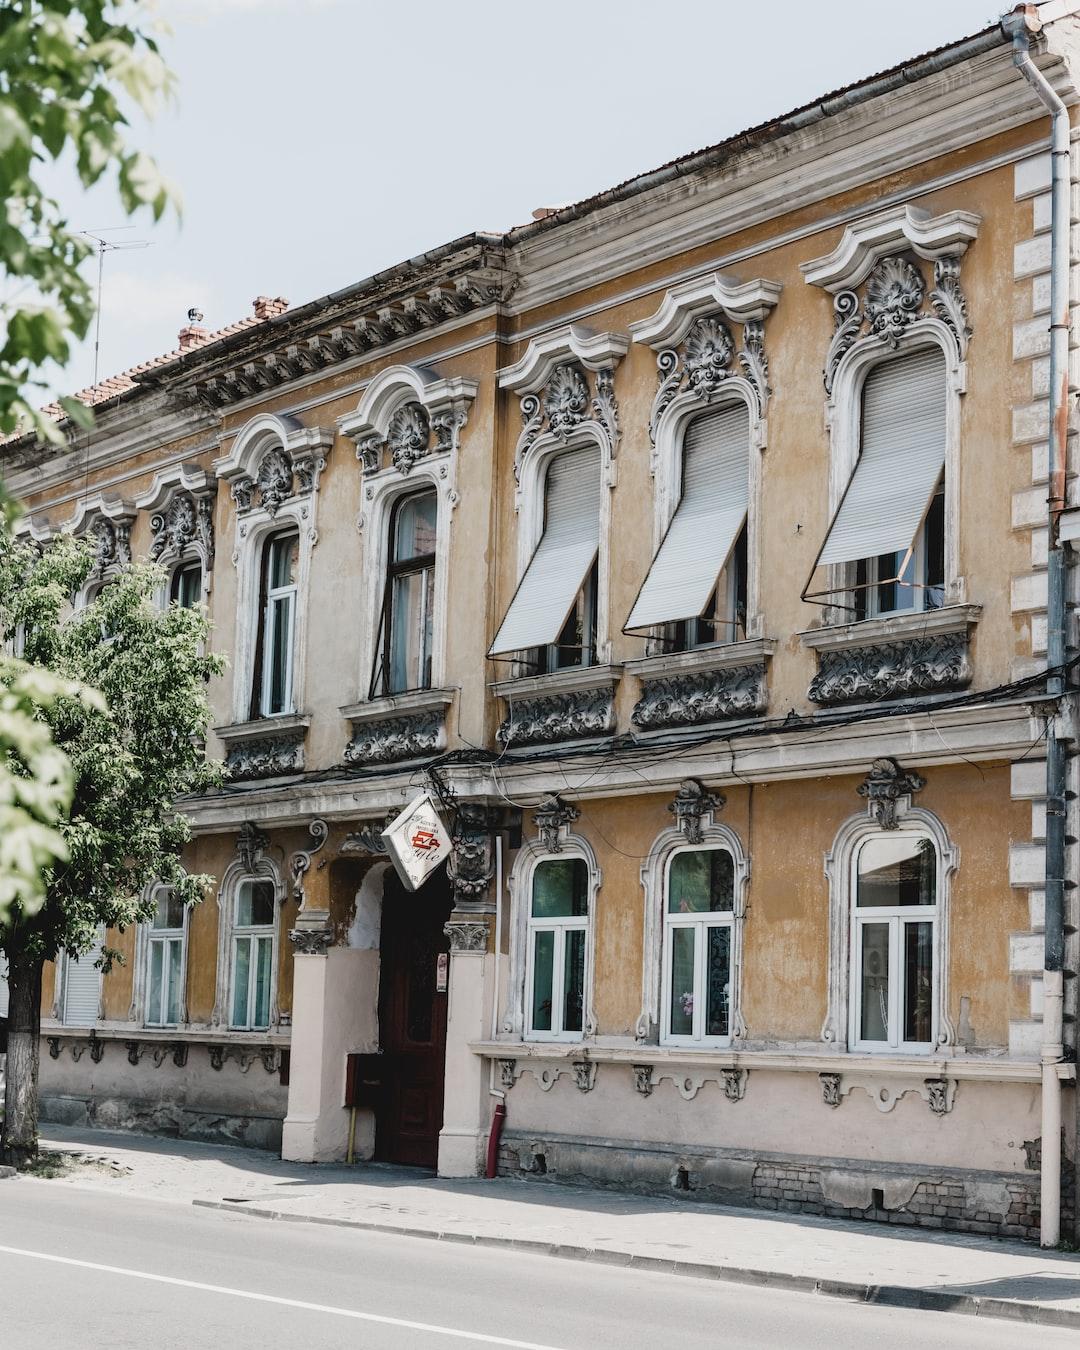 Get on the bus in Targu Mures